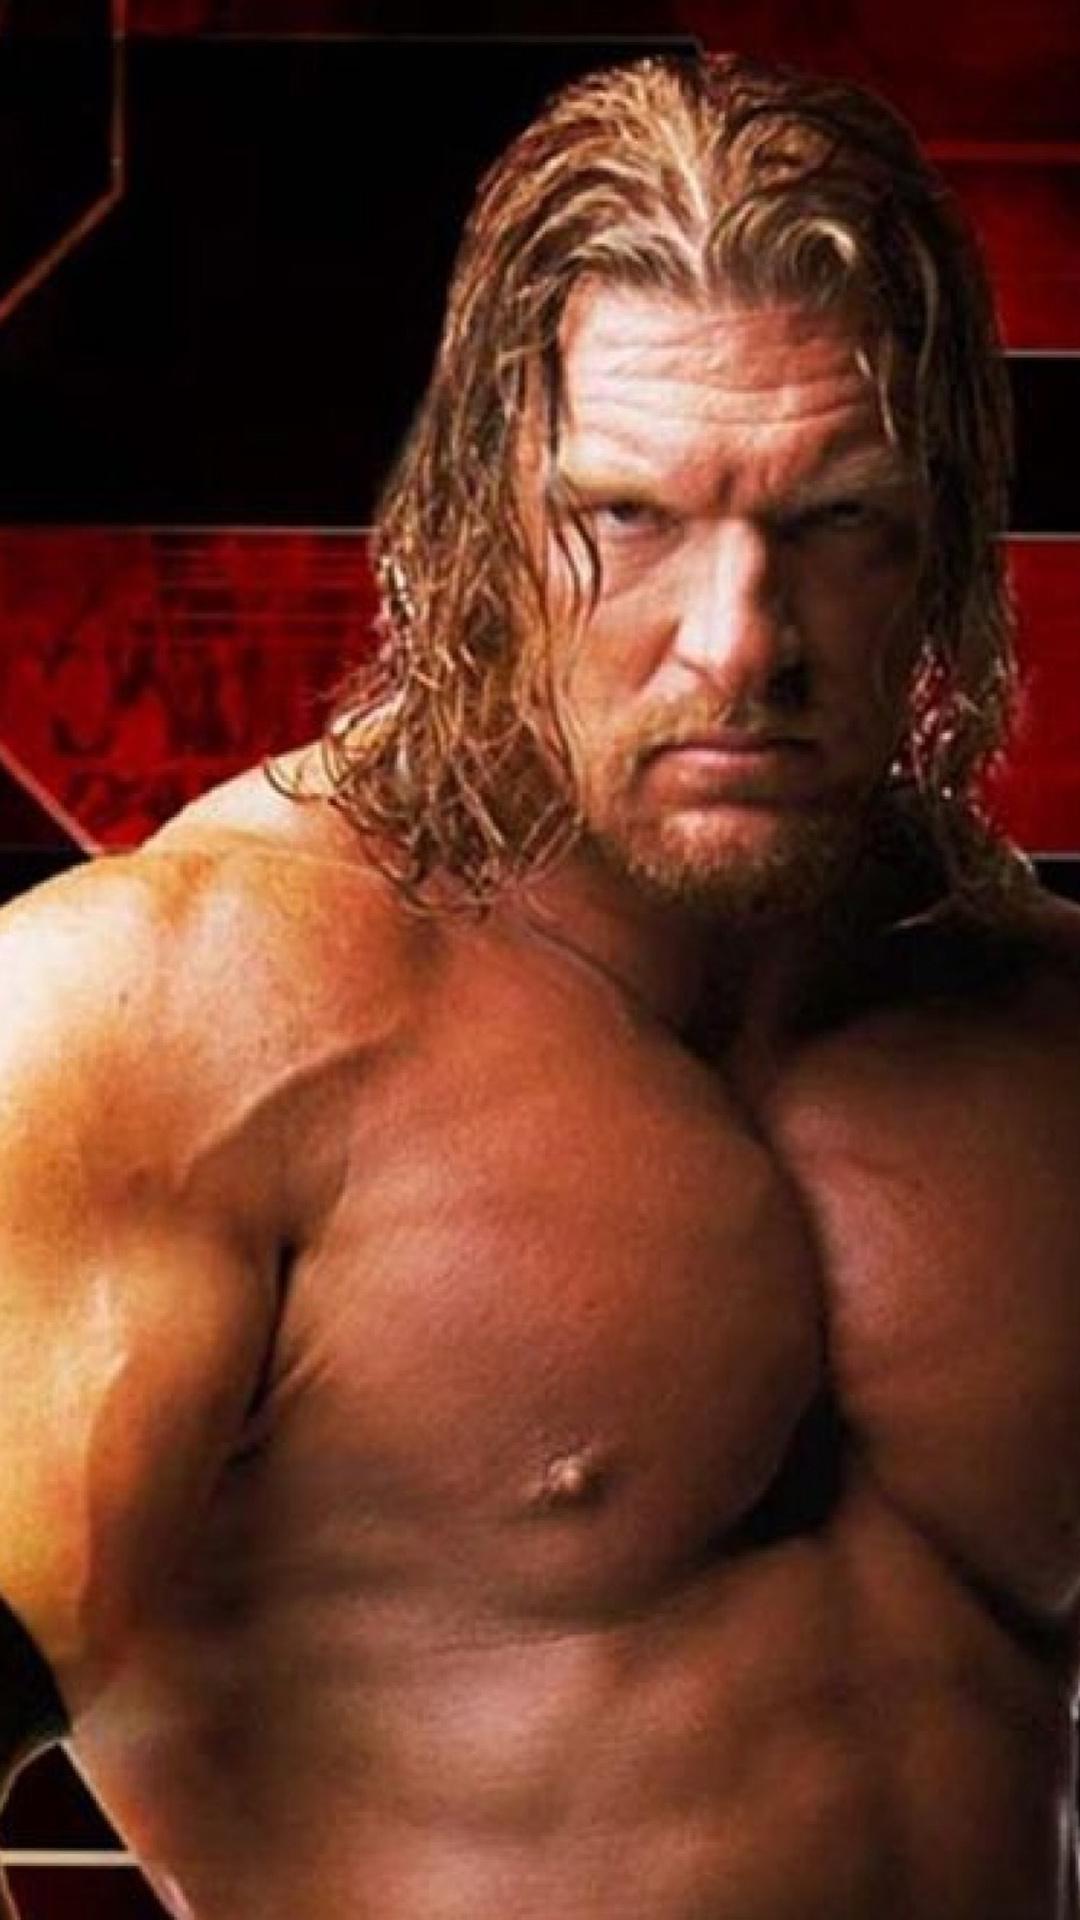 Download Wwe Superstar Triple H Free Pure 4k Ultra Hd Mobile Wallpaper